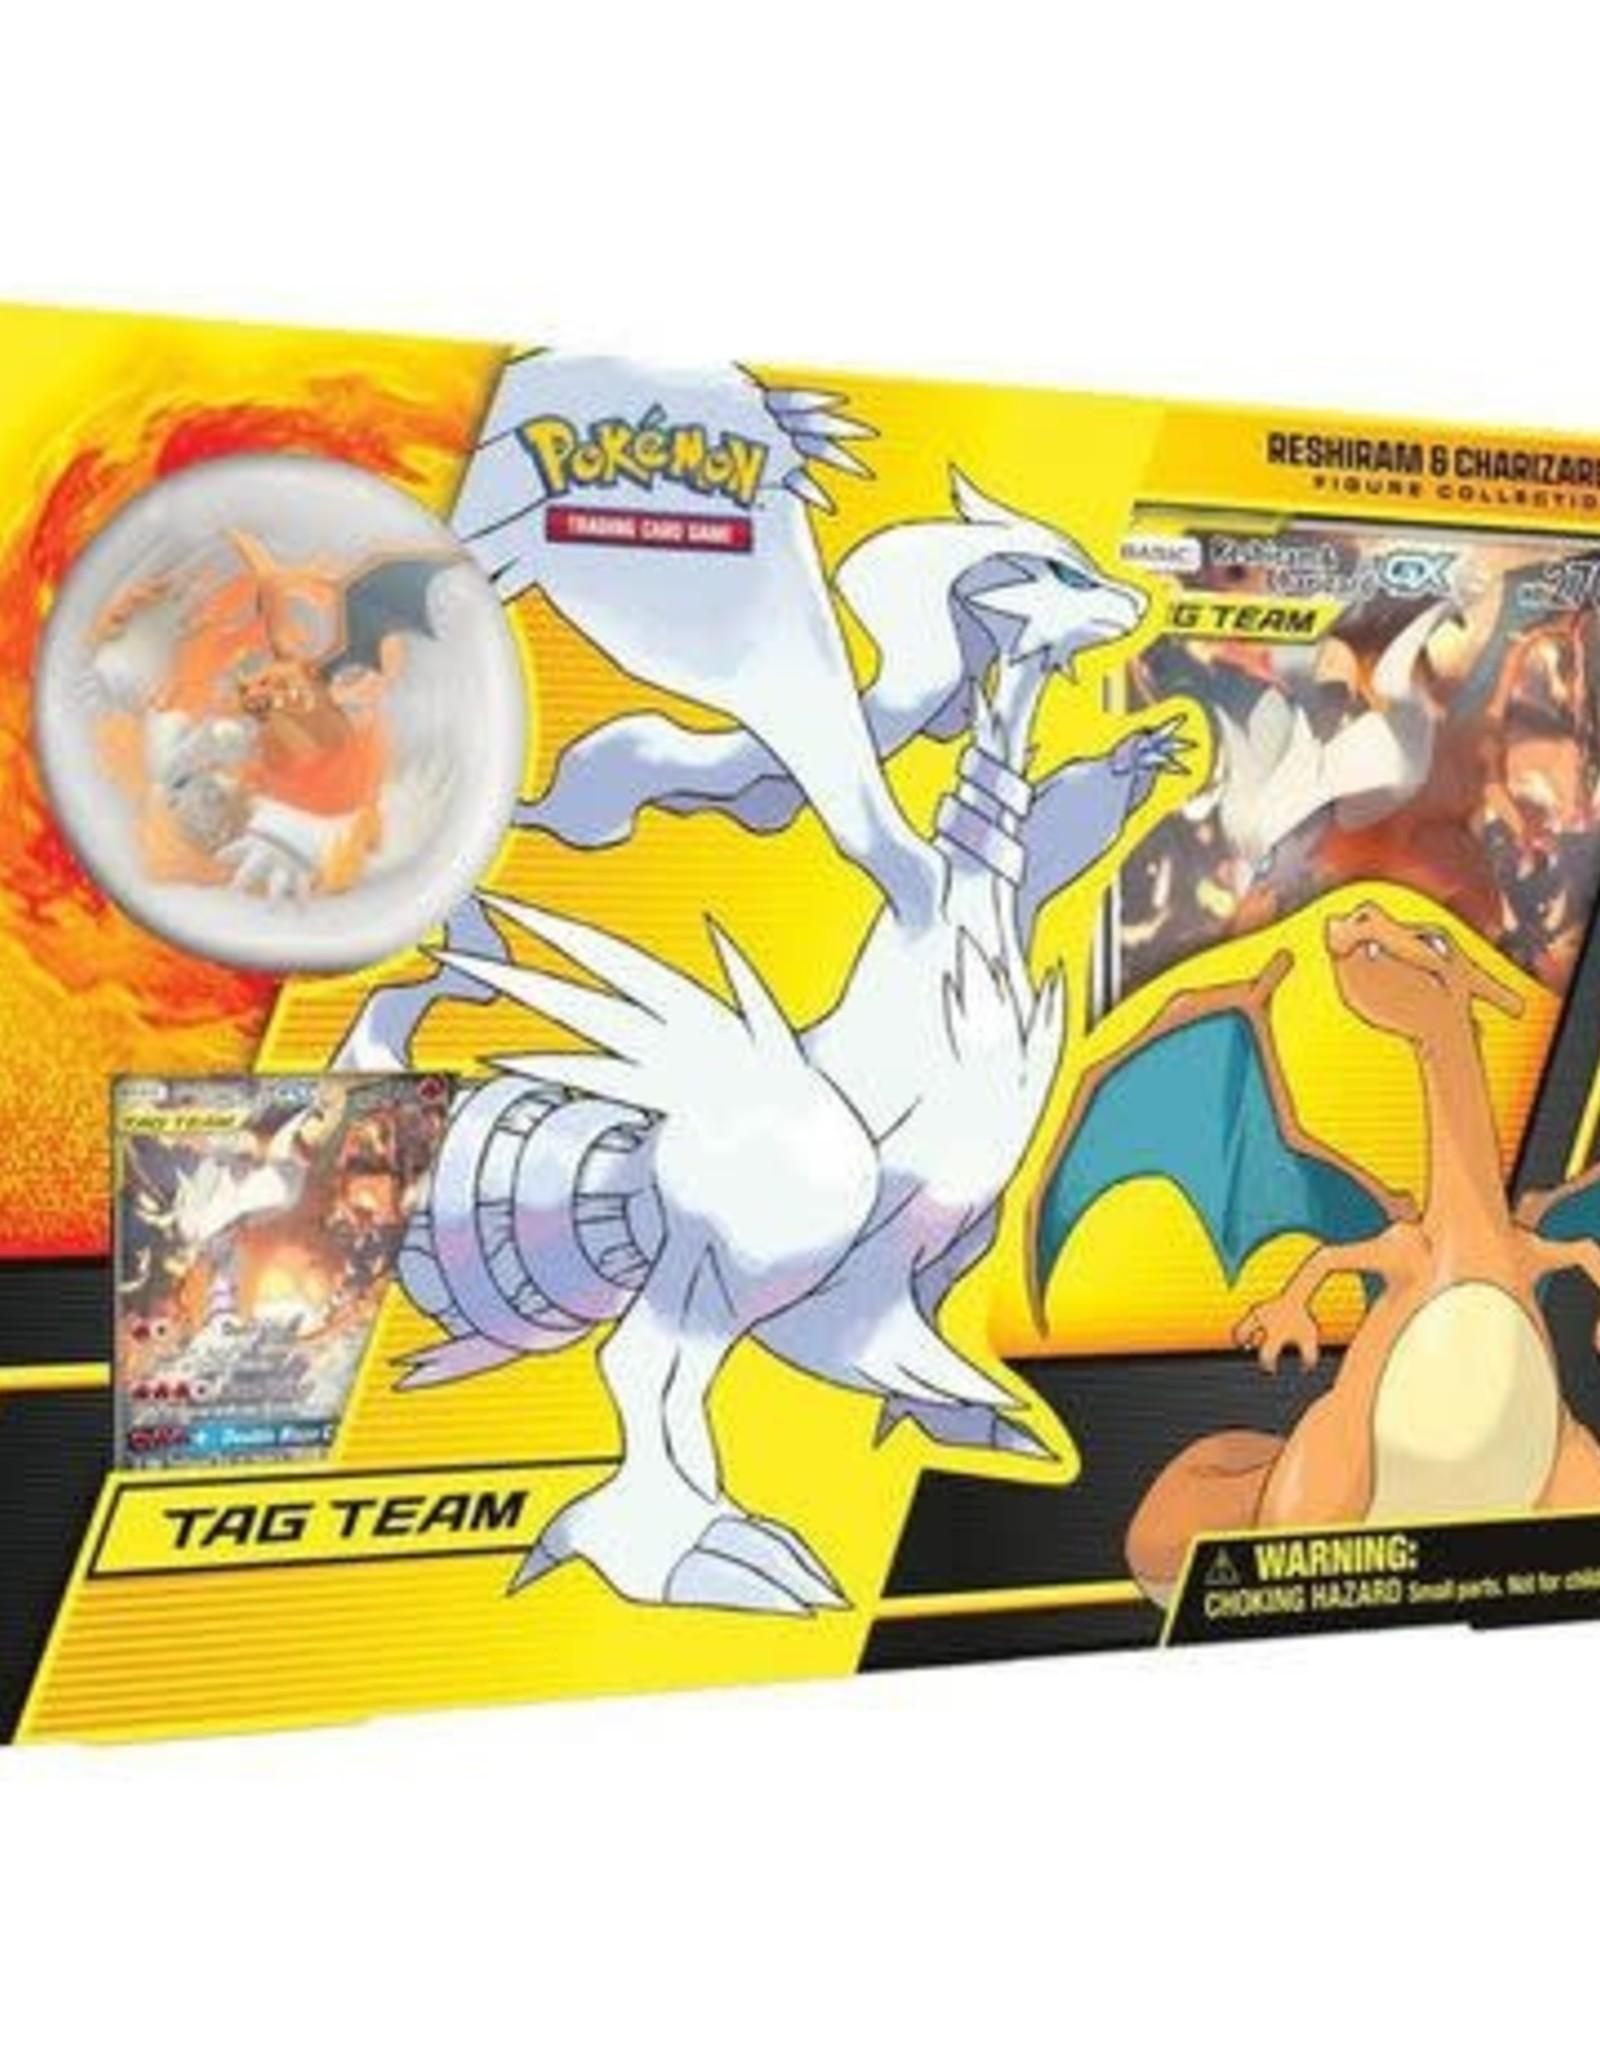 Pokemon POKEMON : Reshiram and Charizard GX Figure Collection